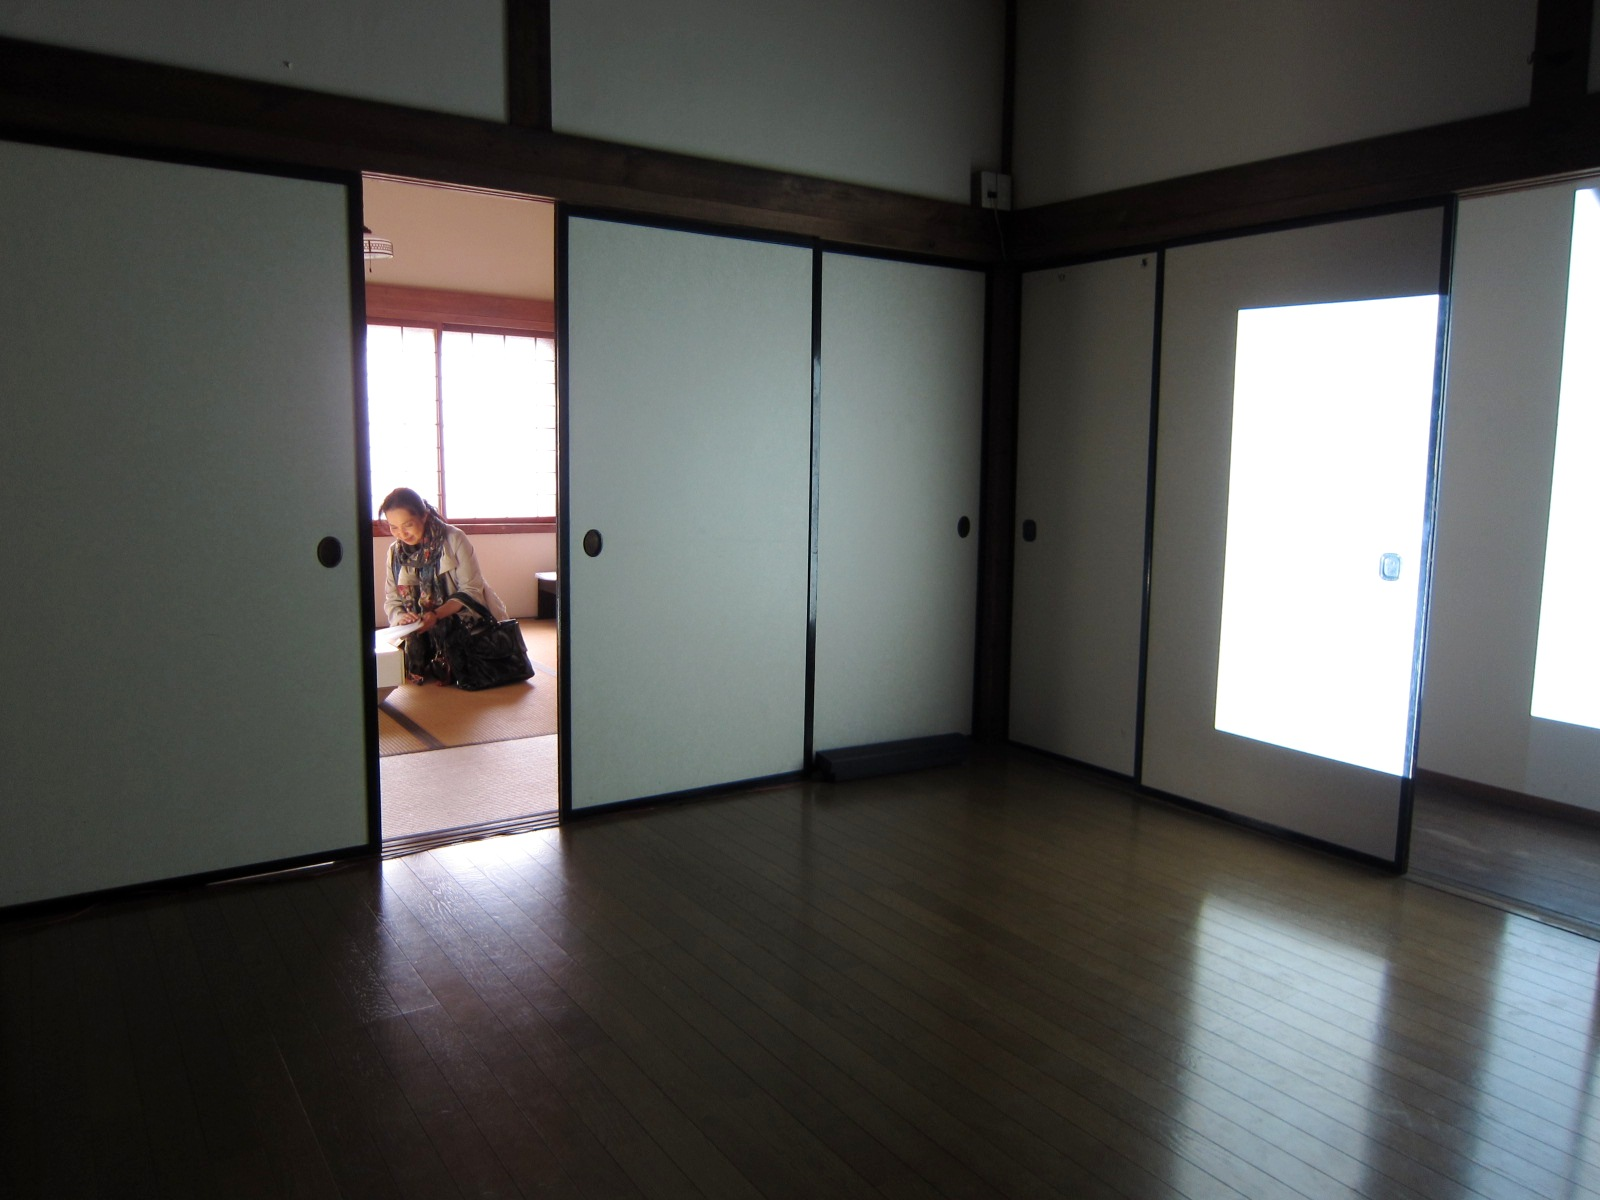 2035)「上野麗市 個展 『De\'tente デタント』」 g.犬養 4月17日(水)~4月29日(月)_f0126829_984125.jpg